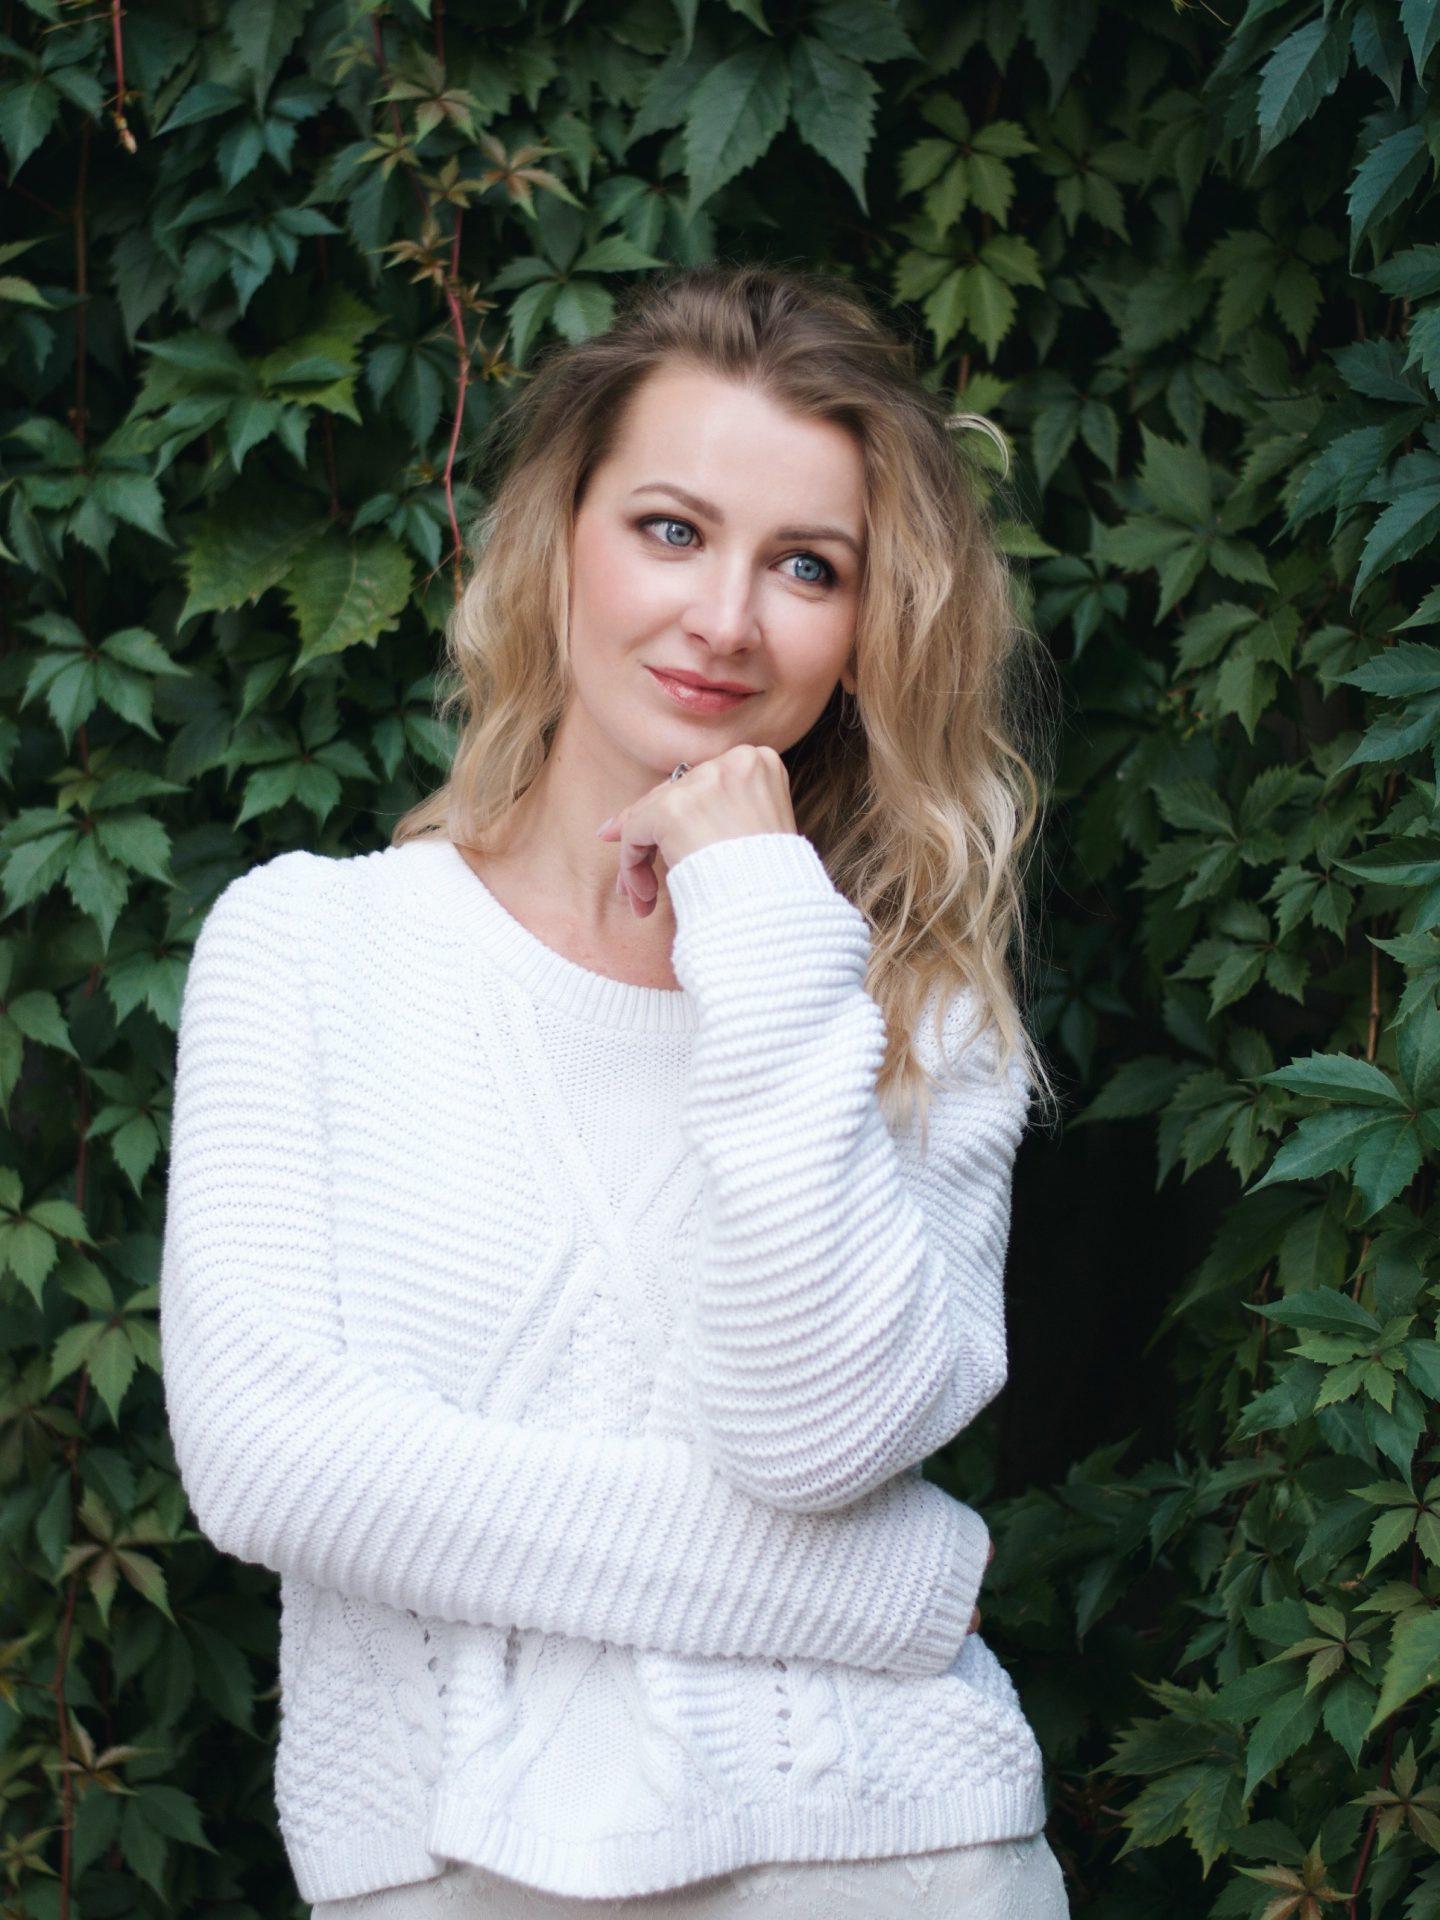 Оксана Мизгаева - блогеры пишут за блогеров. 3